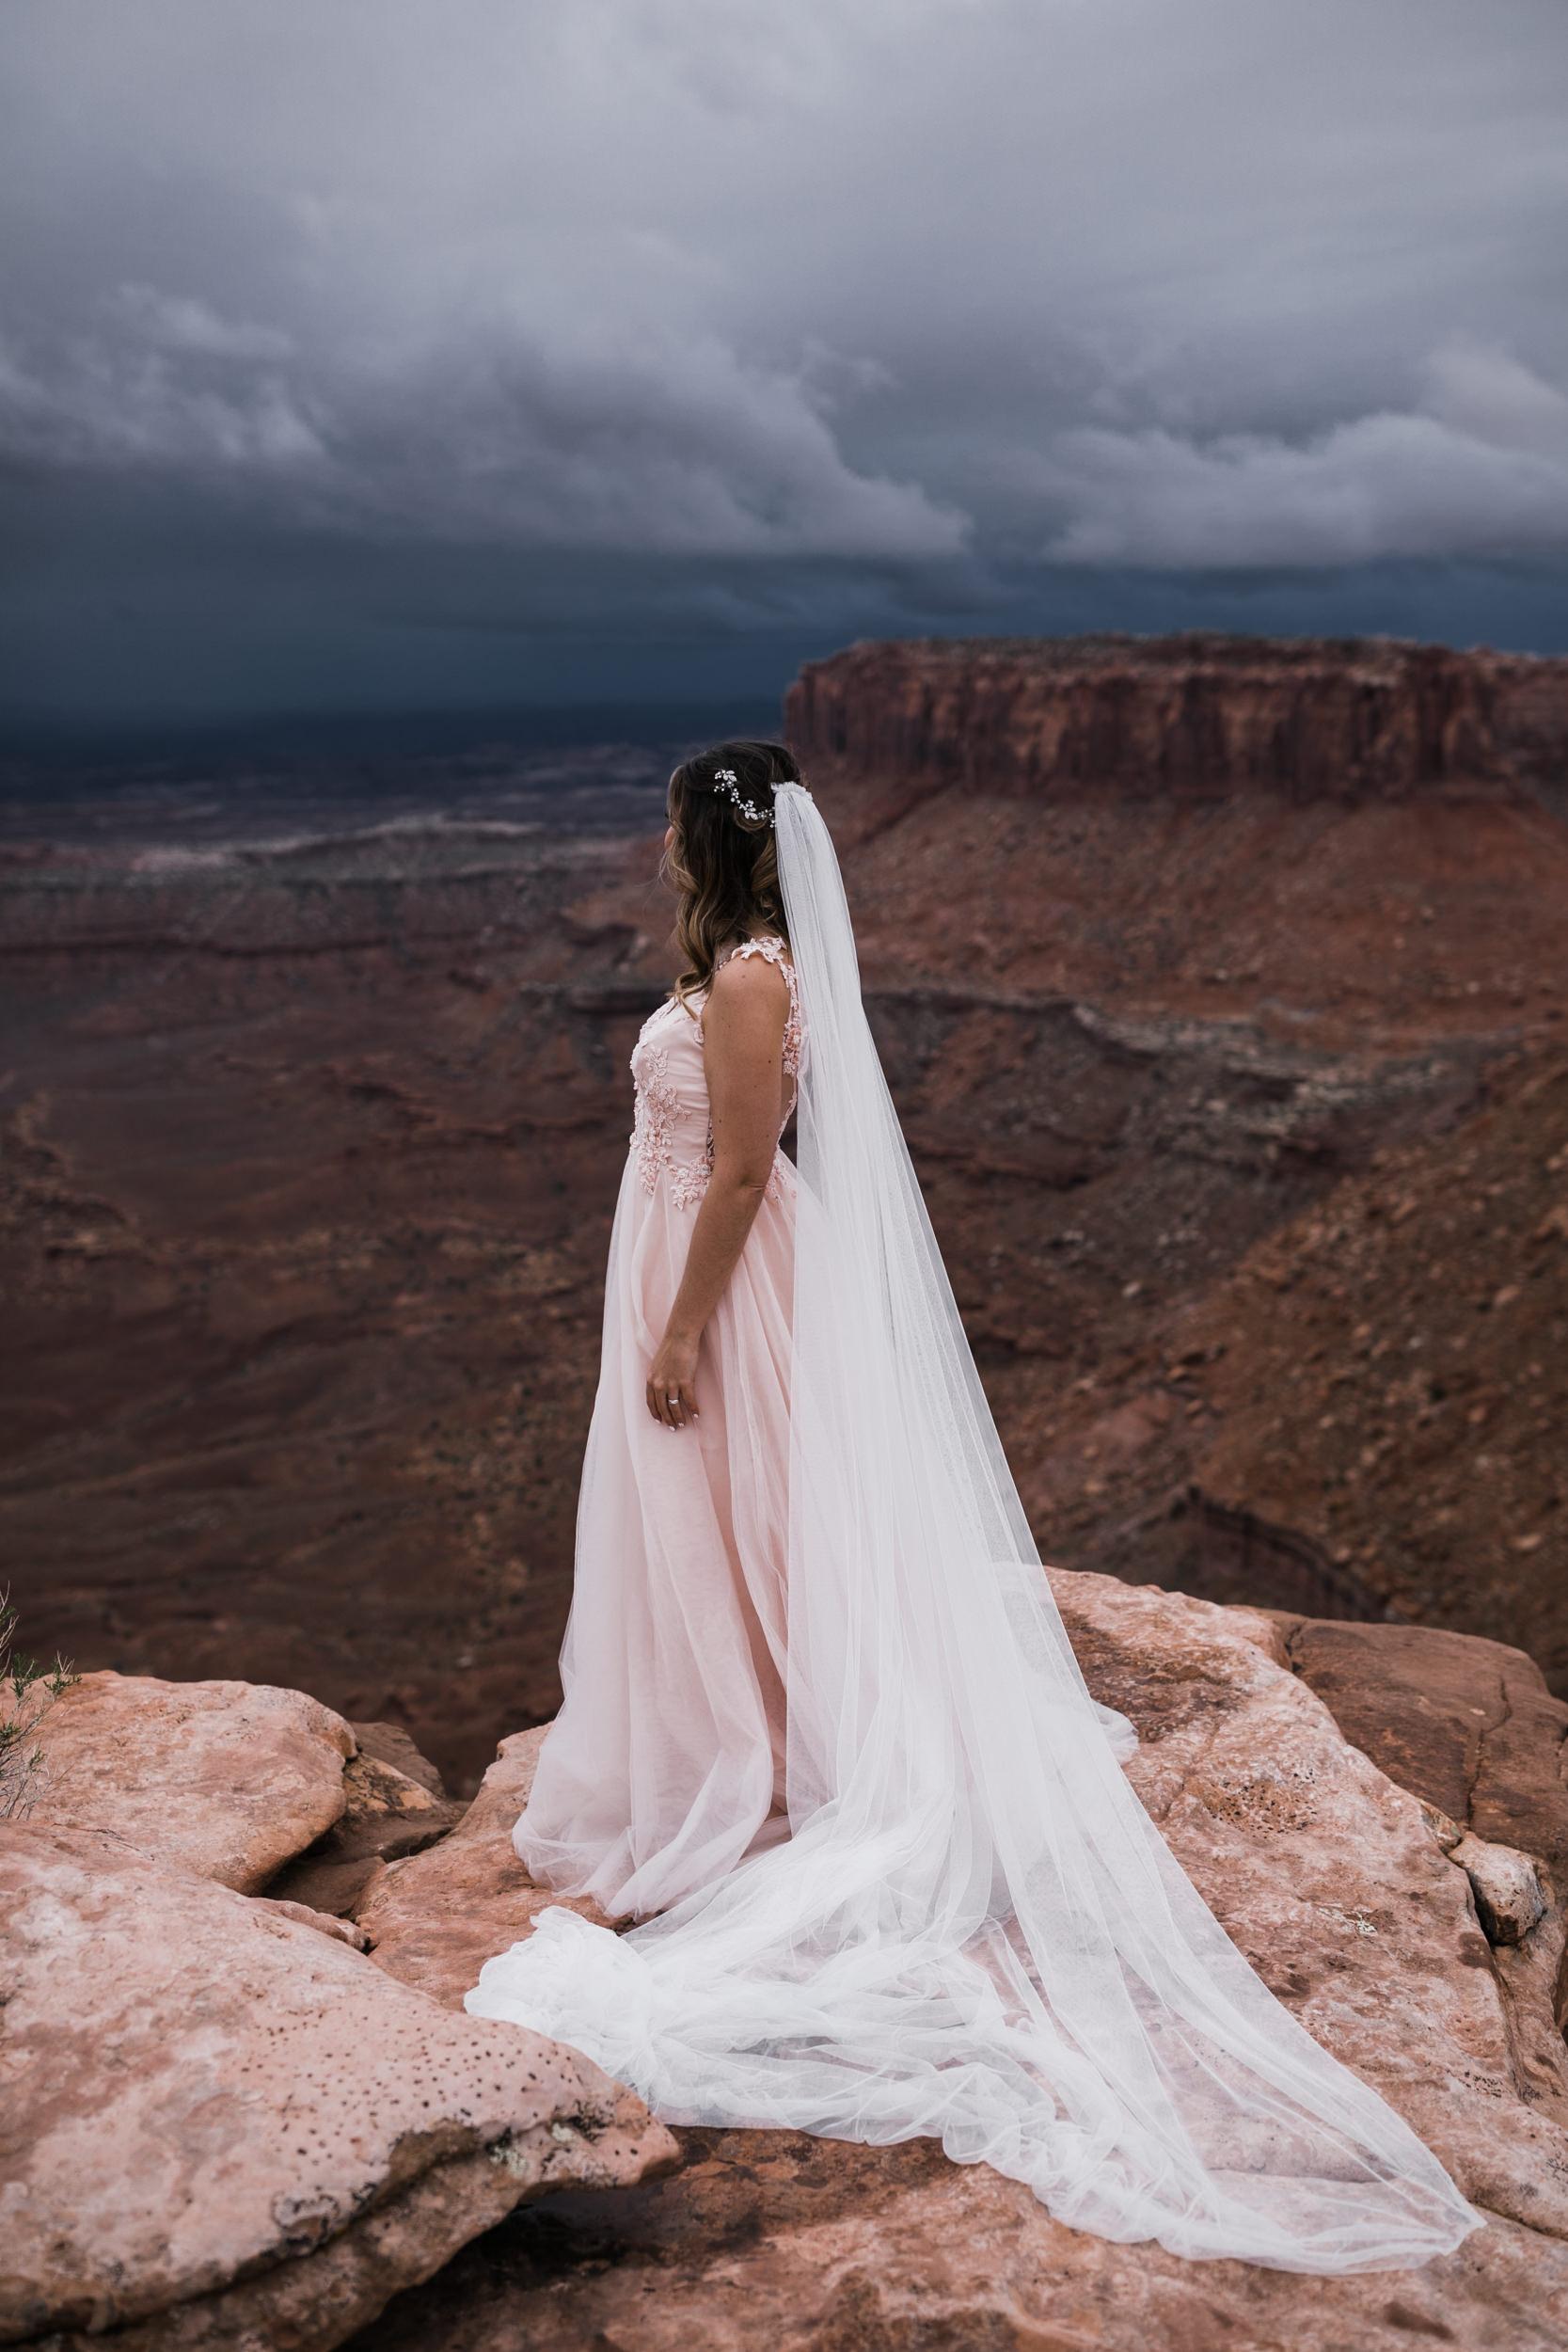 Hearnes-Elopement-Photography-Canyonlands-National-Park-Moab-Wedding-27.jpg